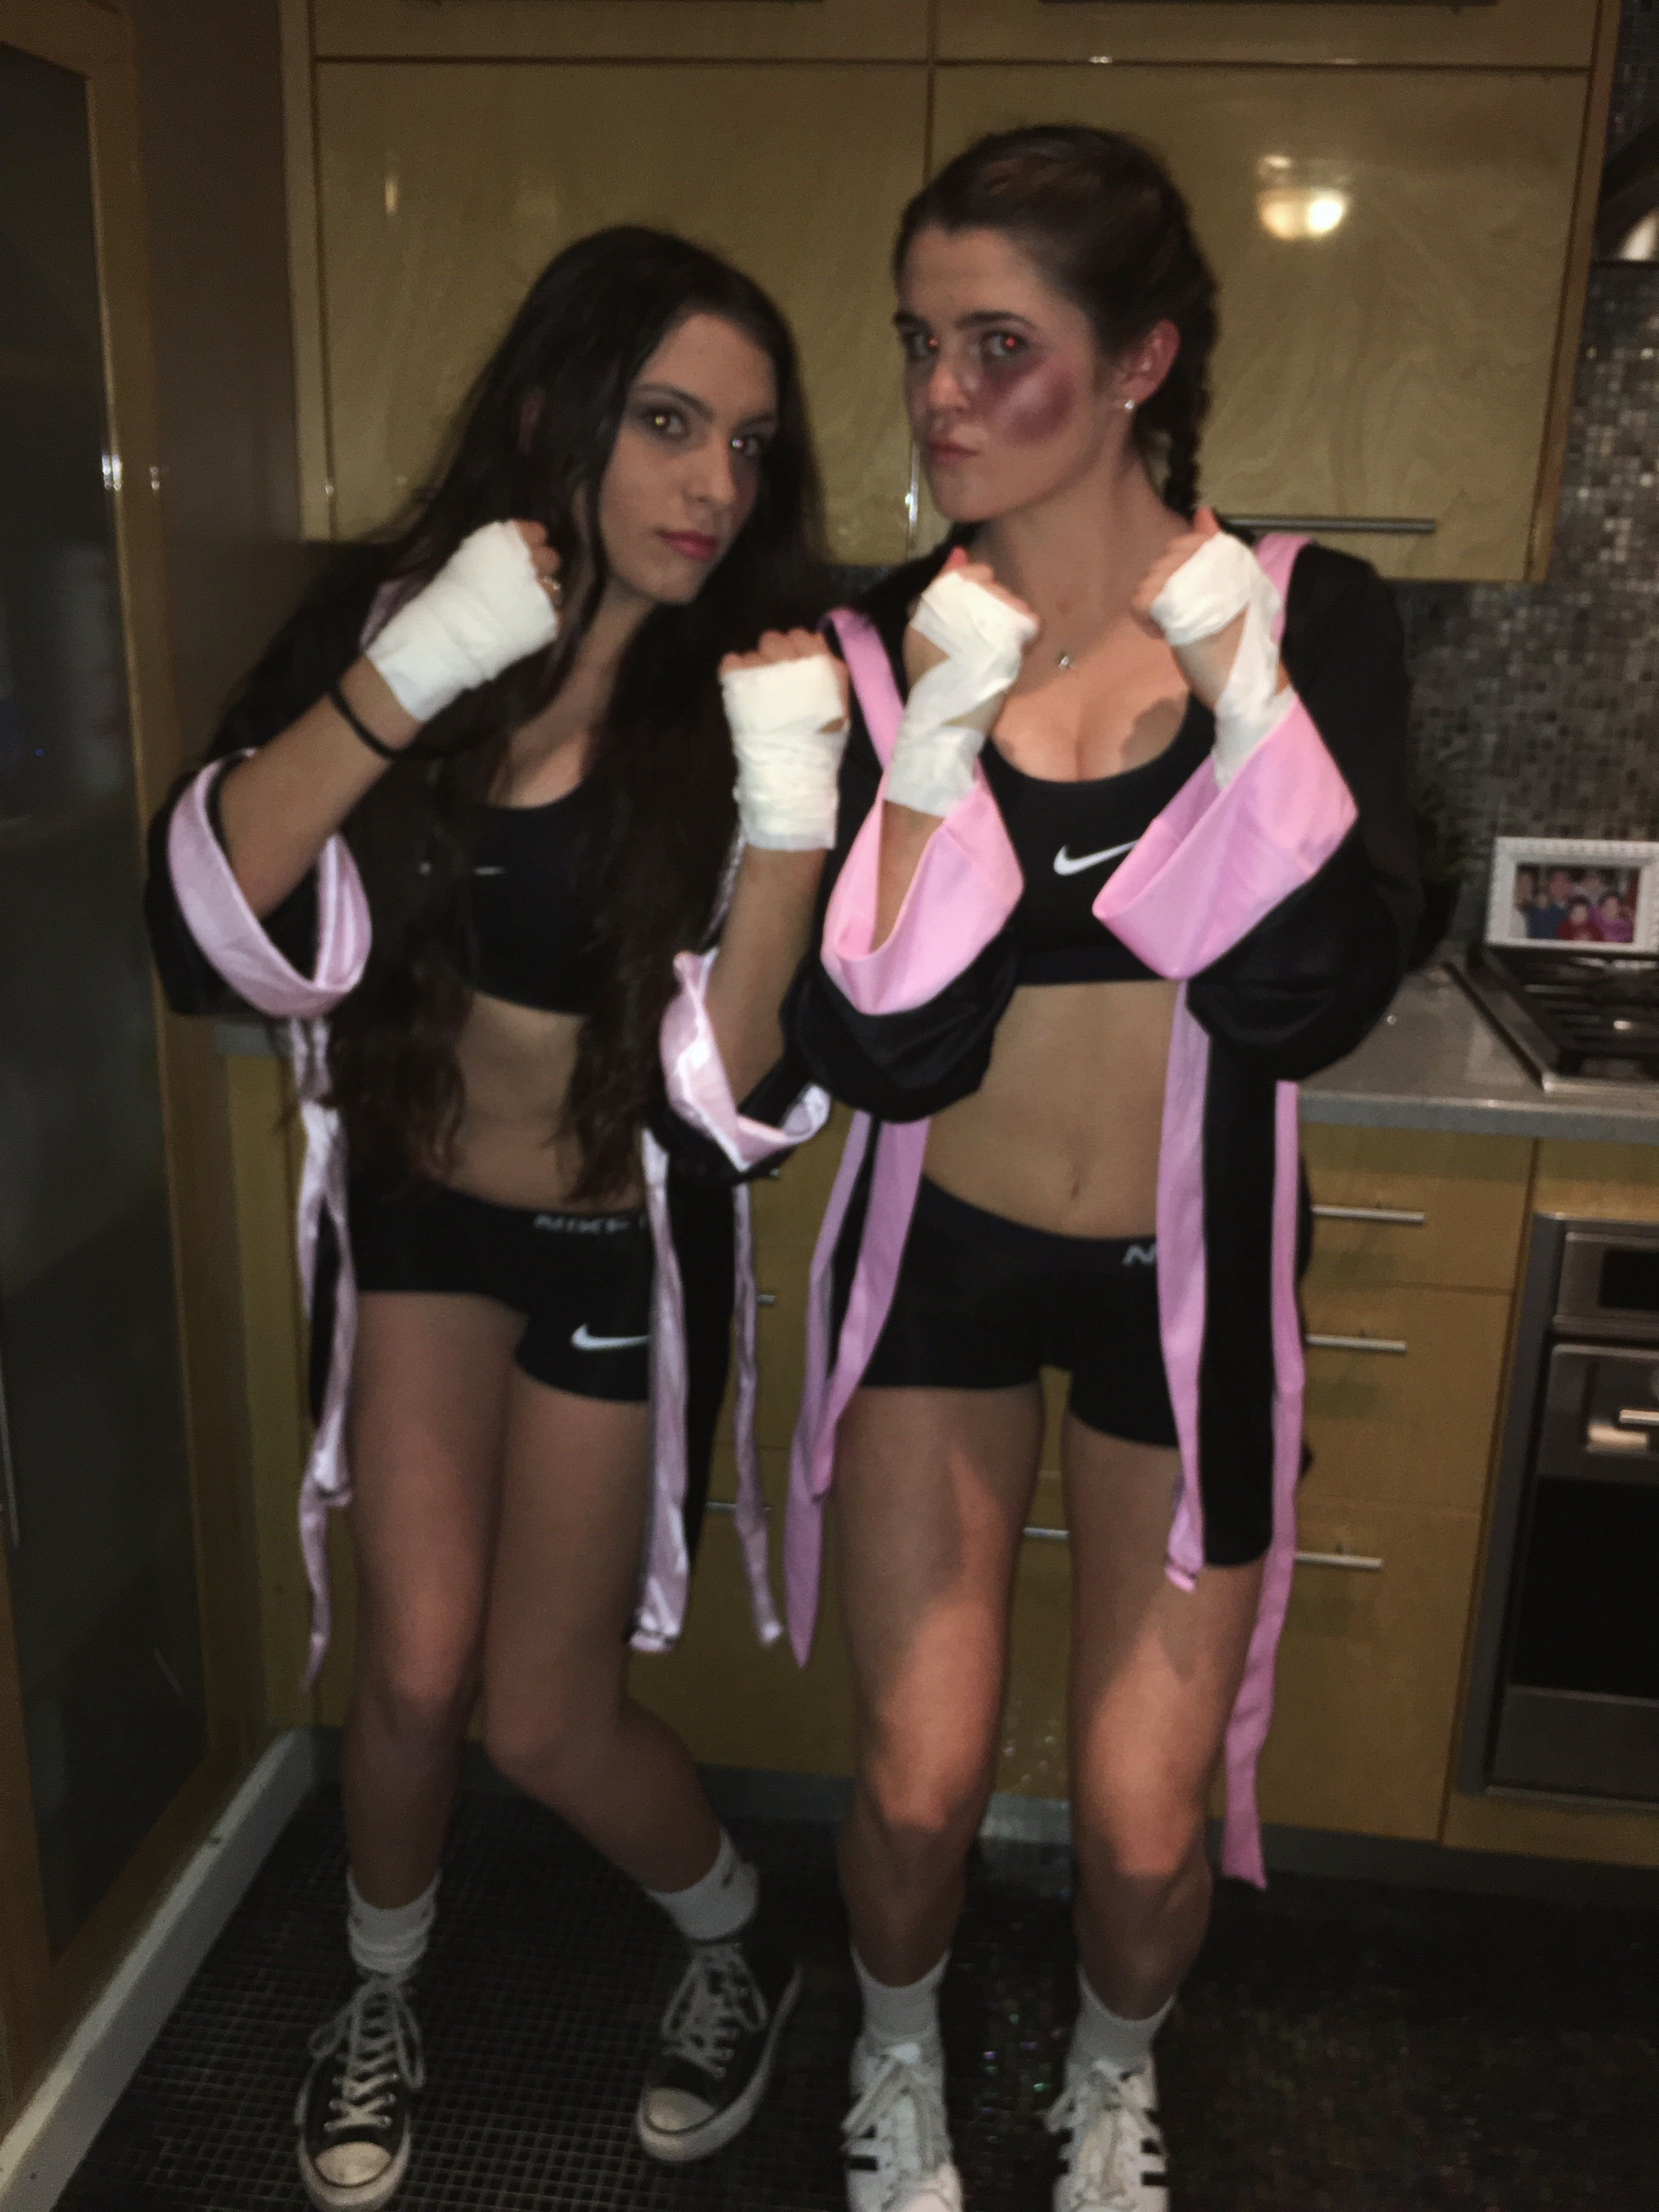 10 Great Sexy Homemade Halloween Costumes Ideas diy boxer costume halloween pinterest costumes halloween 2017 2020